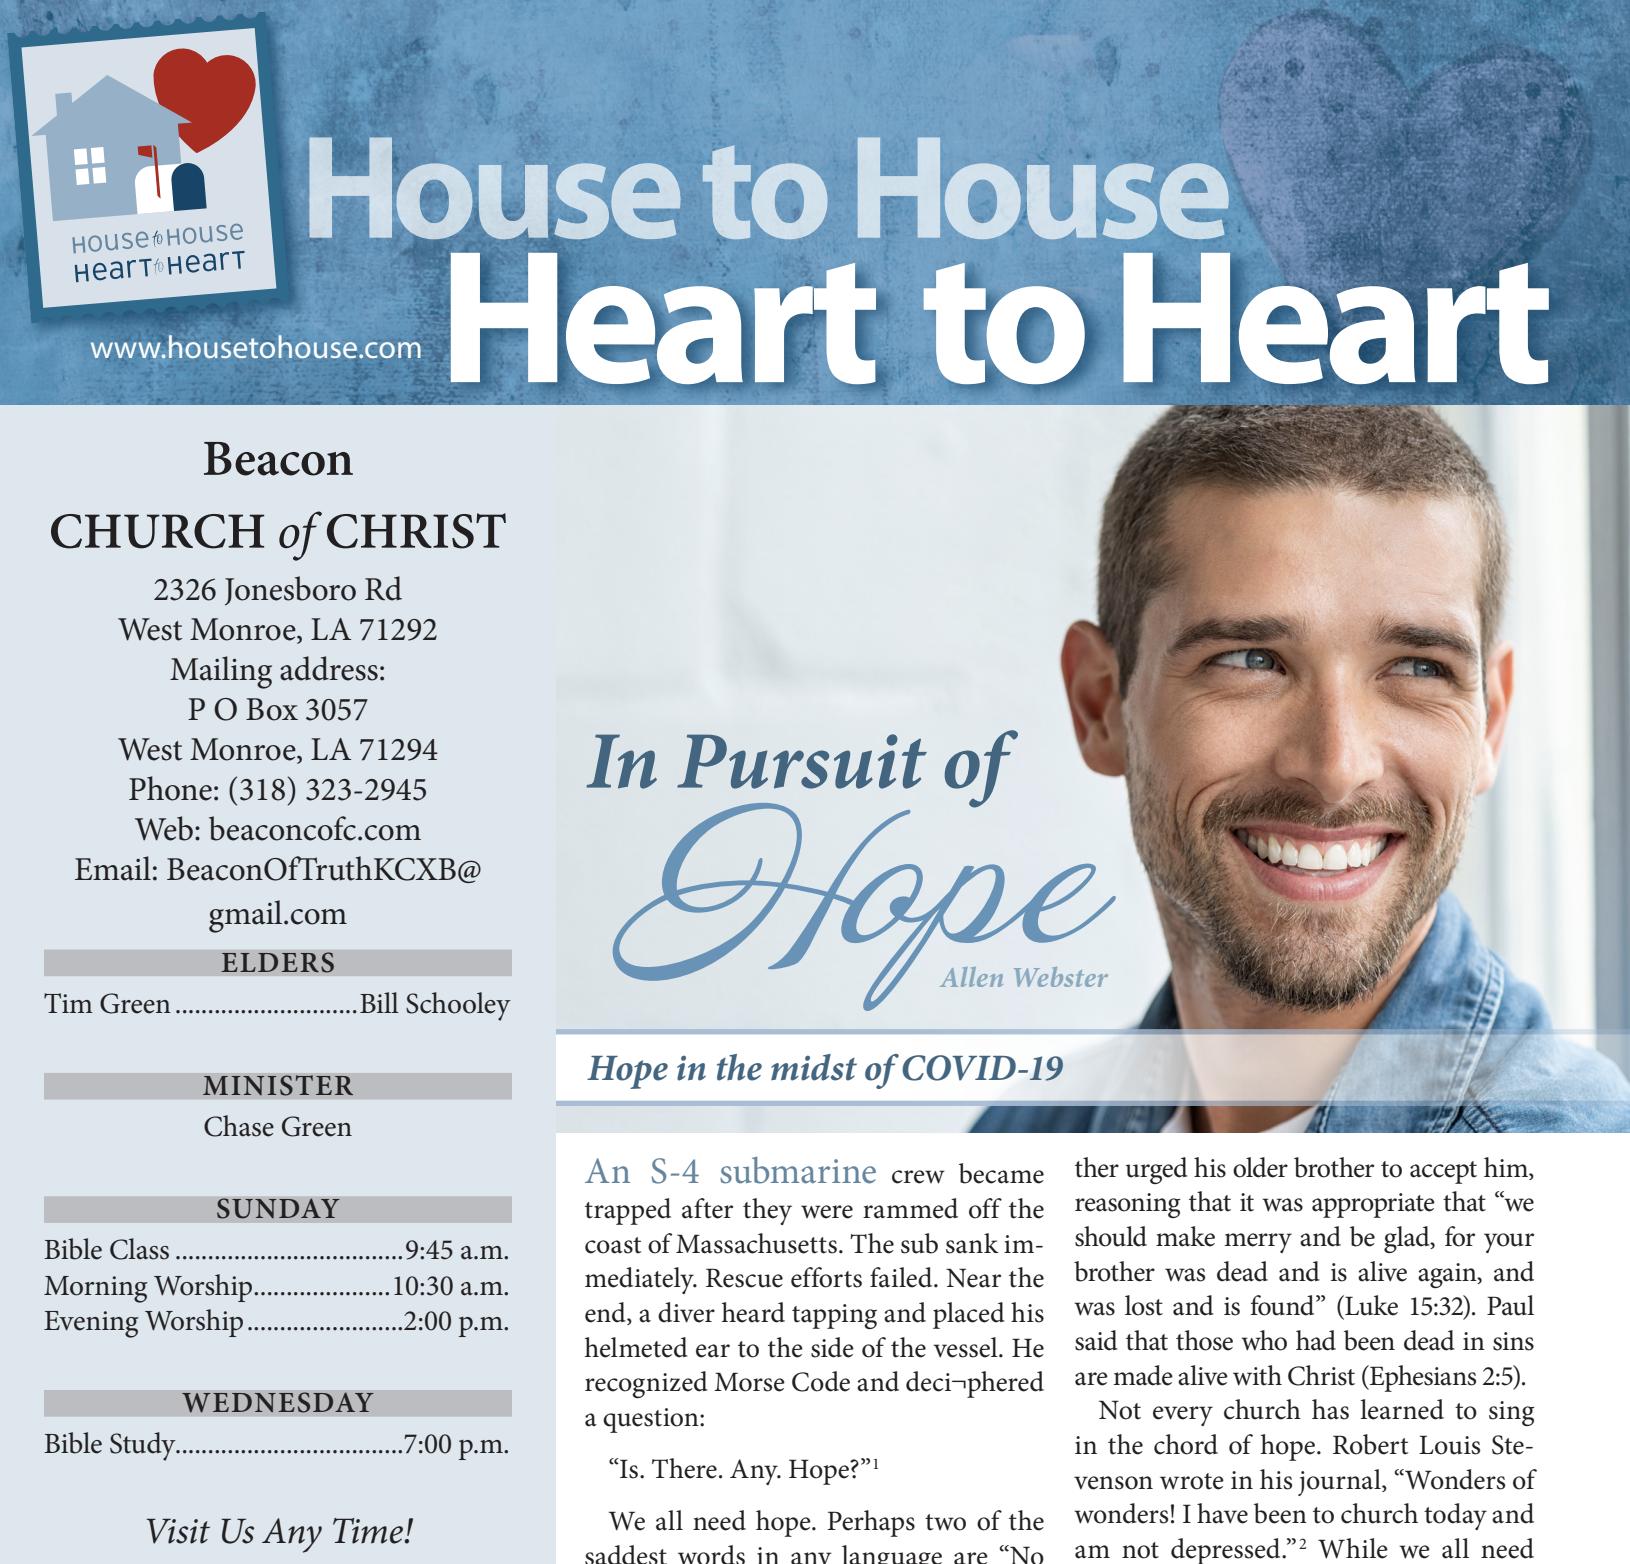 House to House Heart to Heart - Hope